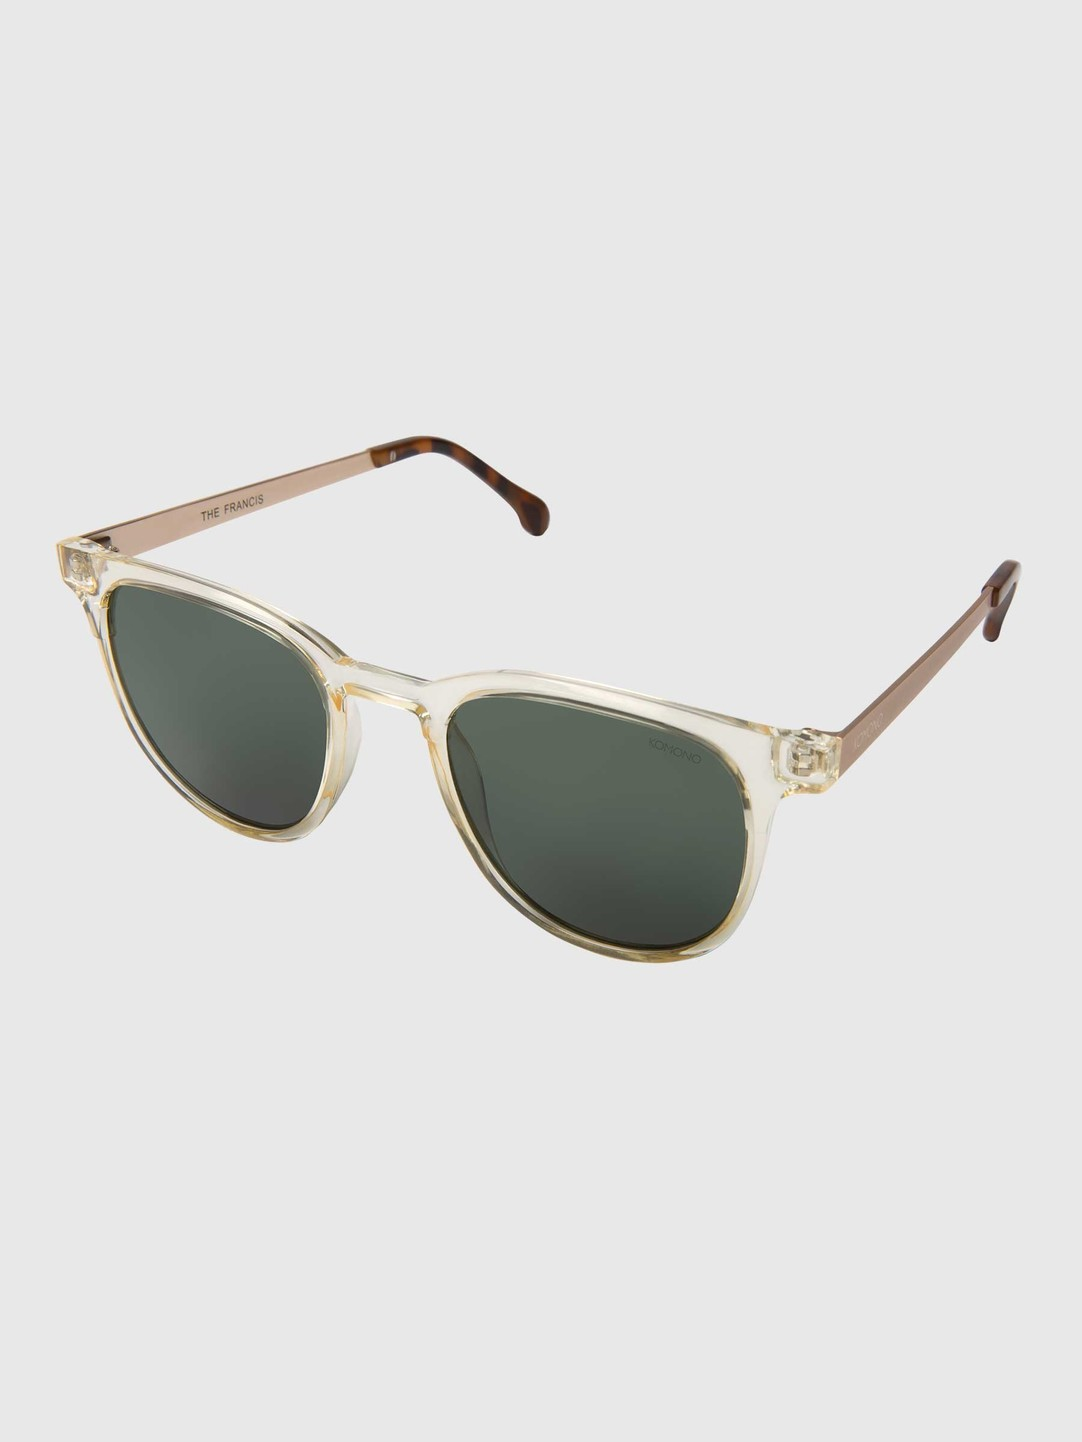 Komono Komono Francis Metal Prosecco Sunglasses KOM-S2273